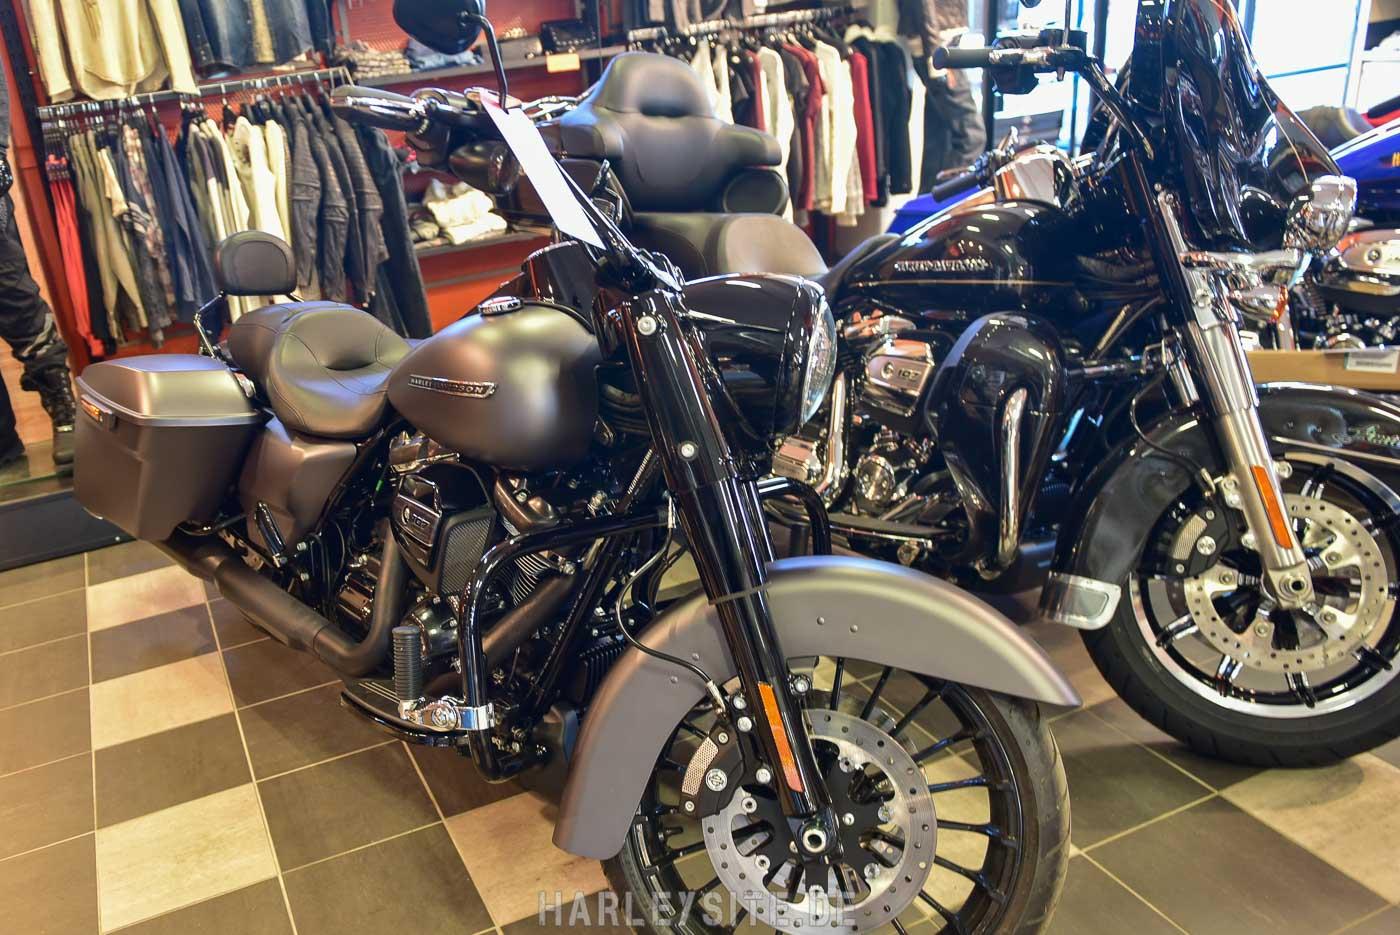 389 Harley Nordkap Tour DSC 8152